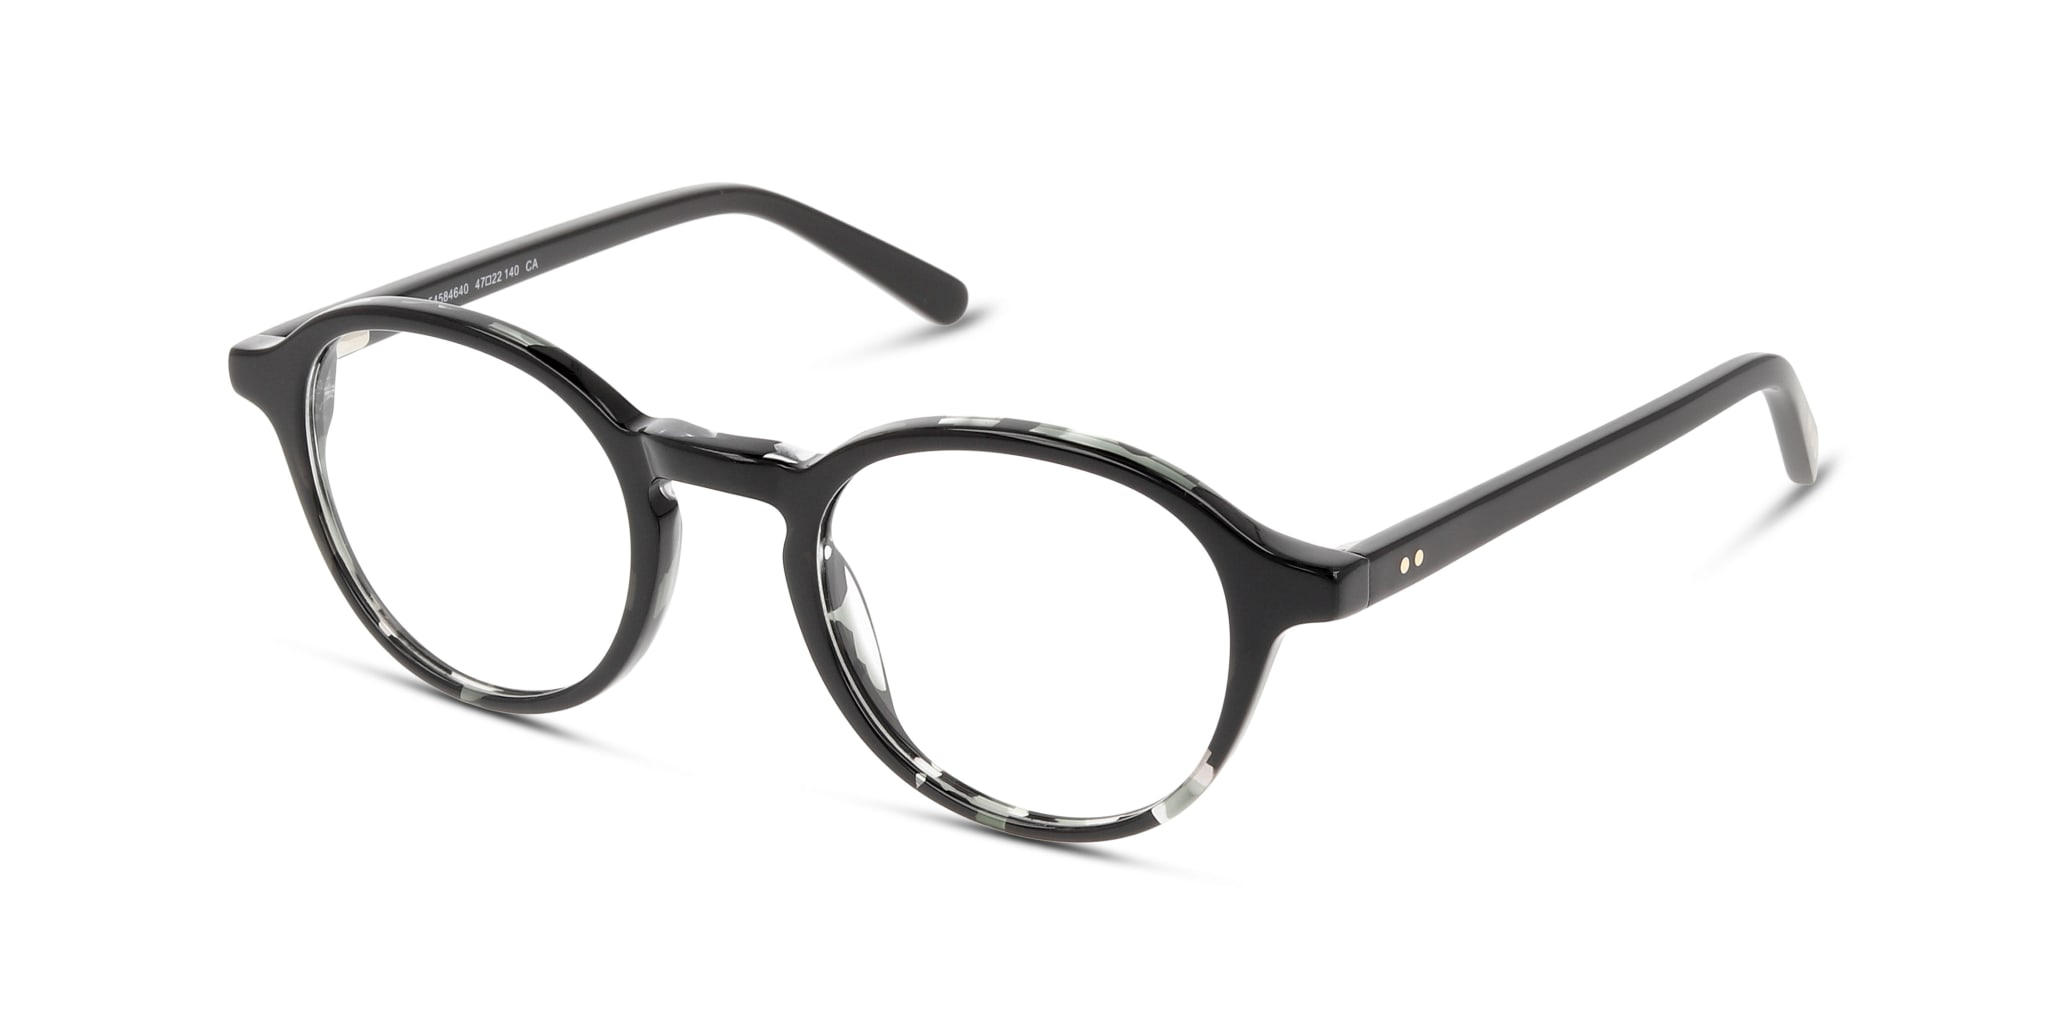 8719154584640-angle-03-in-style-iskm05-eyewear-havana-black